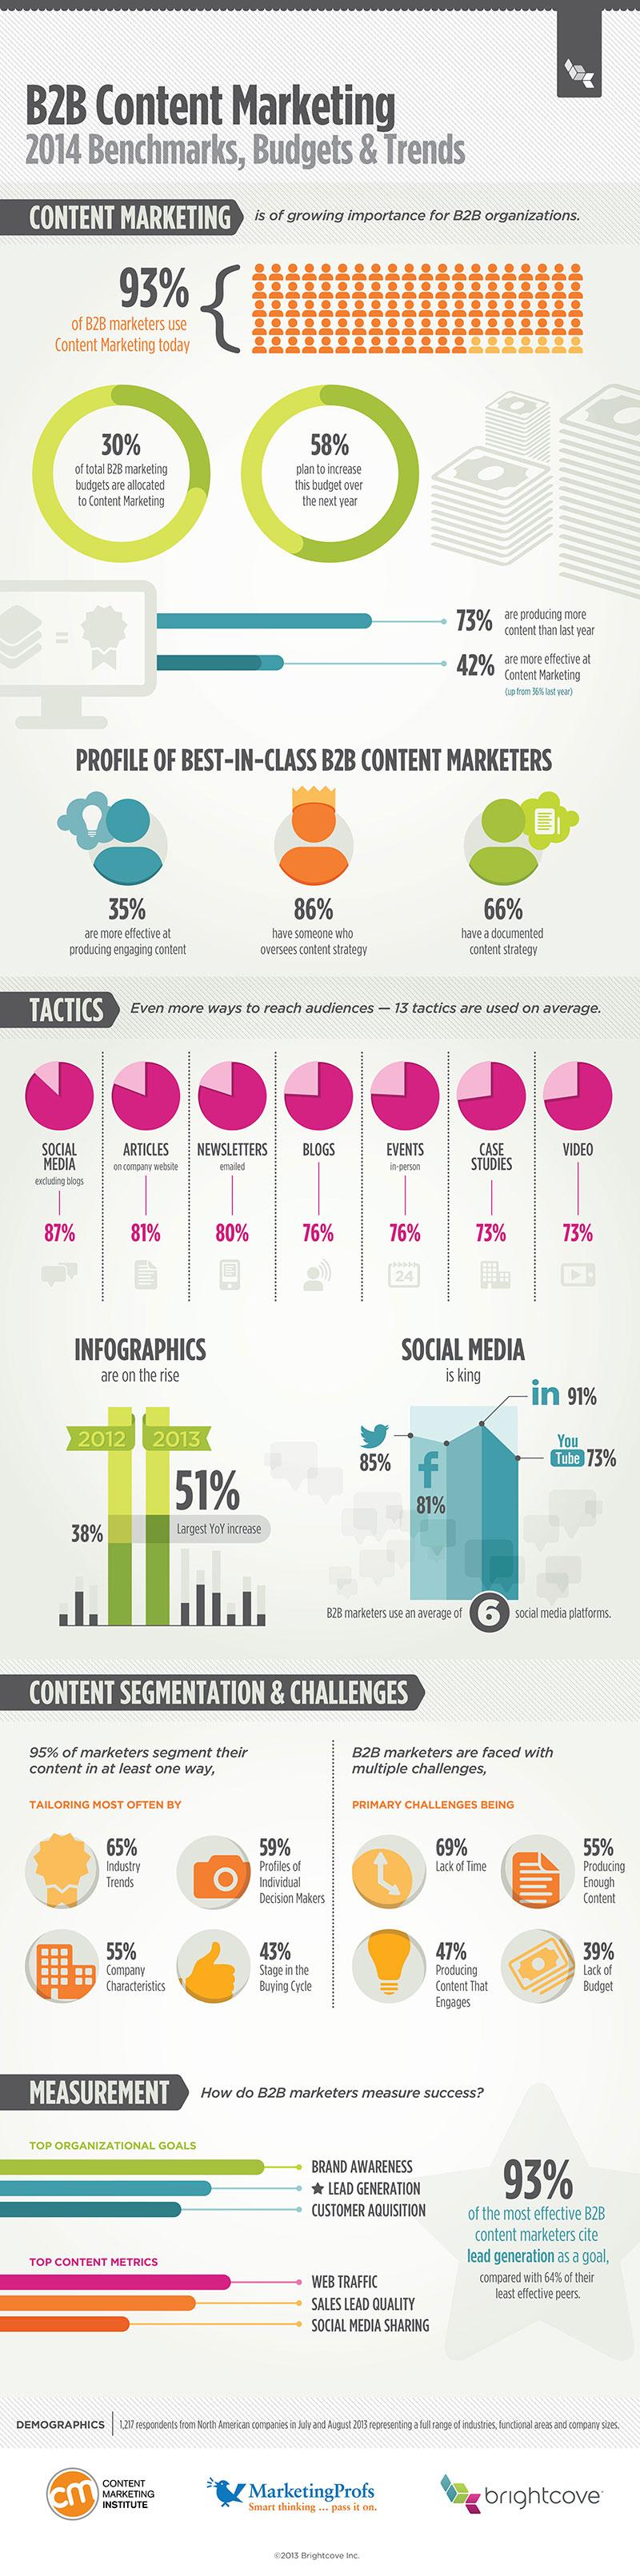 b2b-cmi-infographic-800